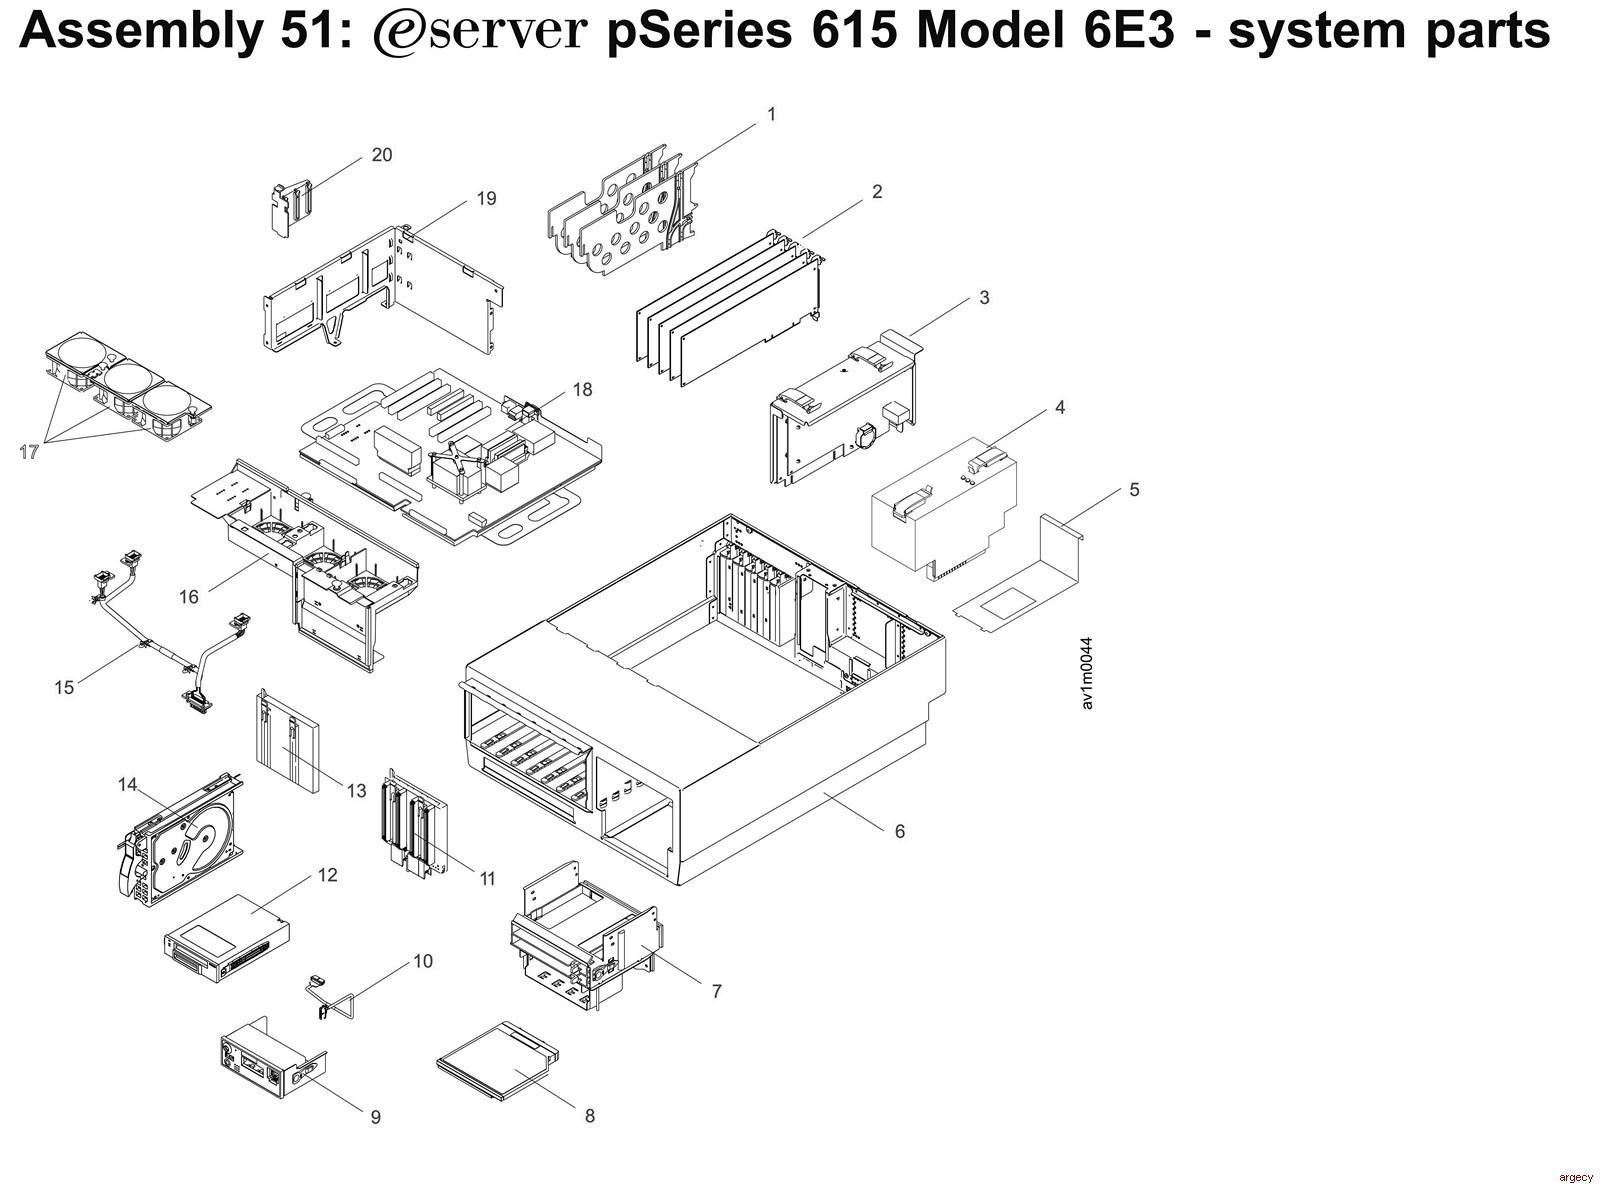 Assembly 38 Preheat Platen Control THRU Assembly 56